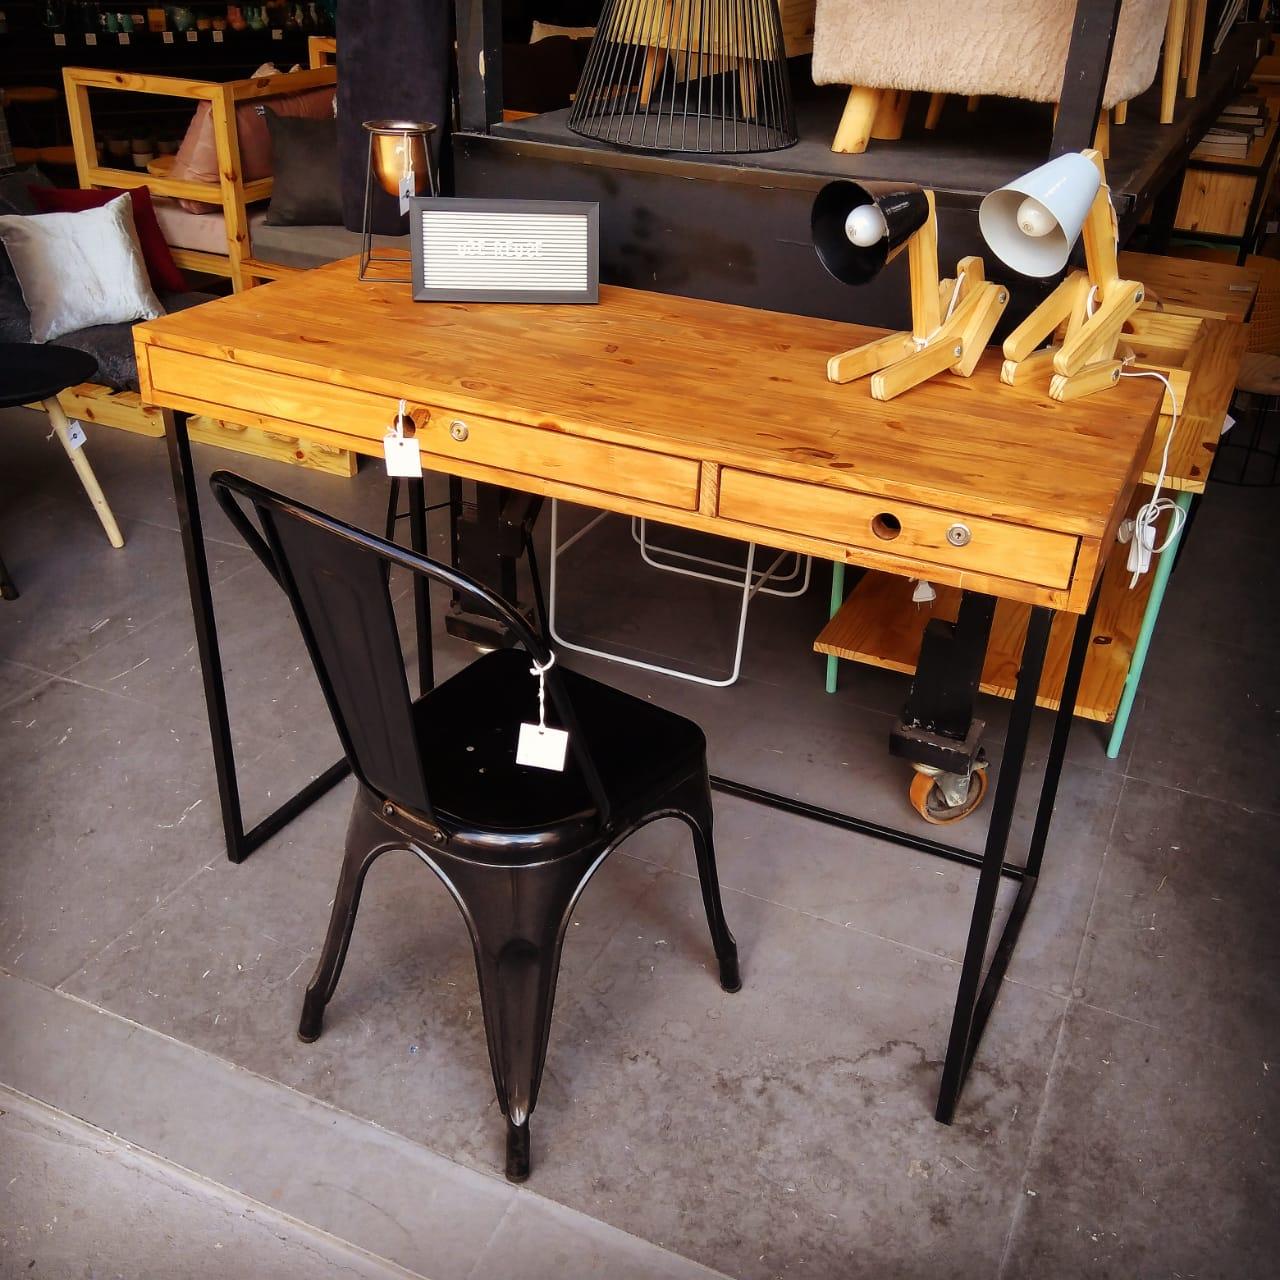 Escrivaninha Industrial - 9